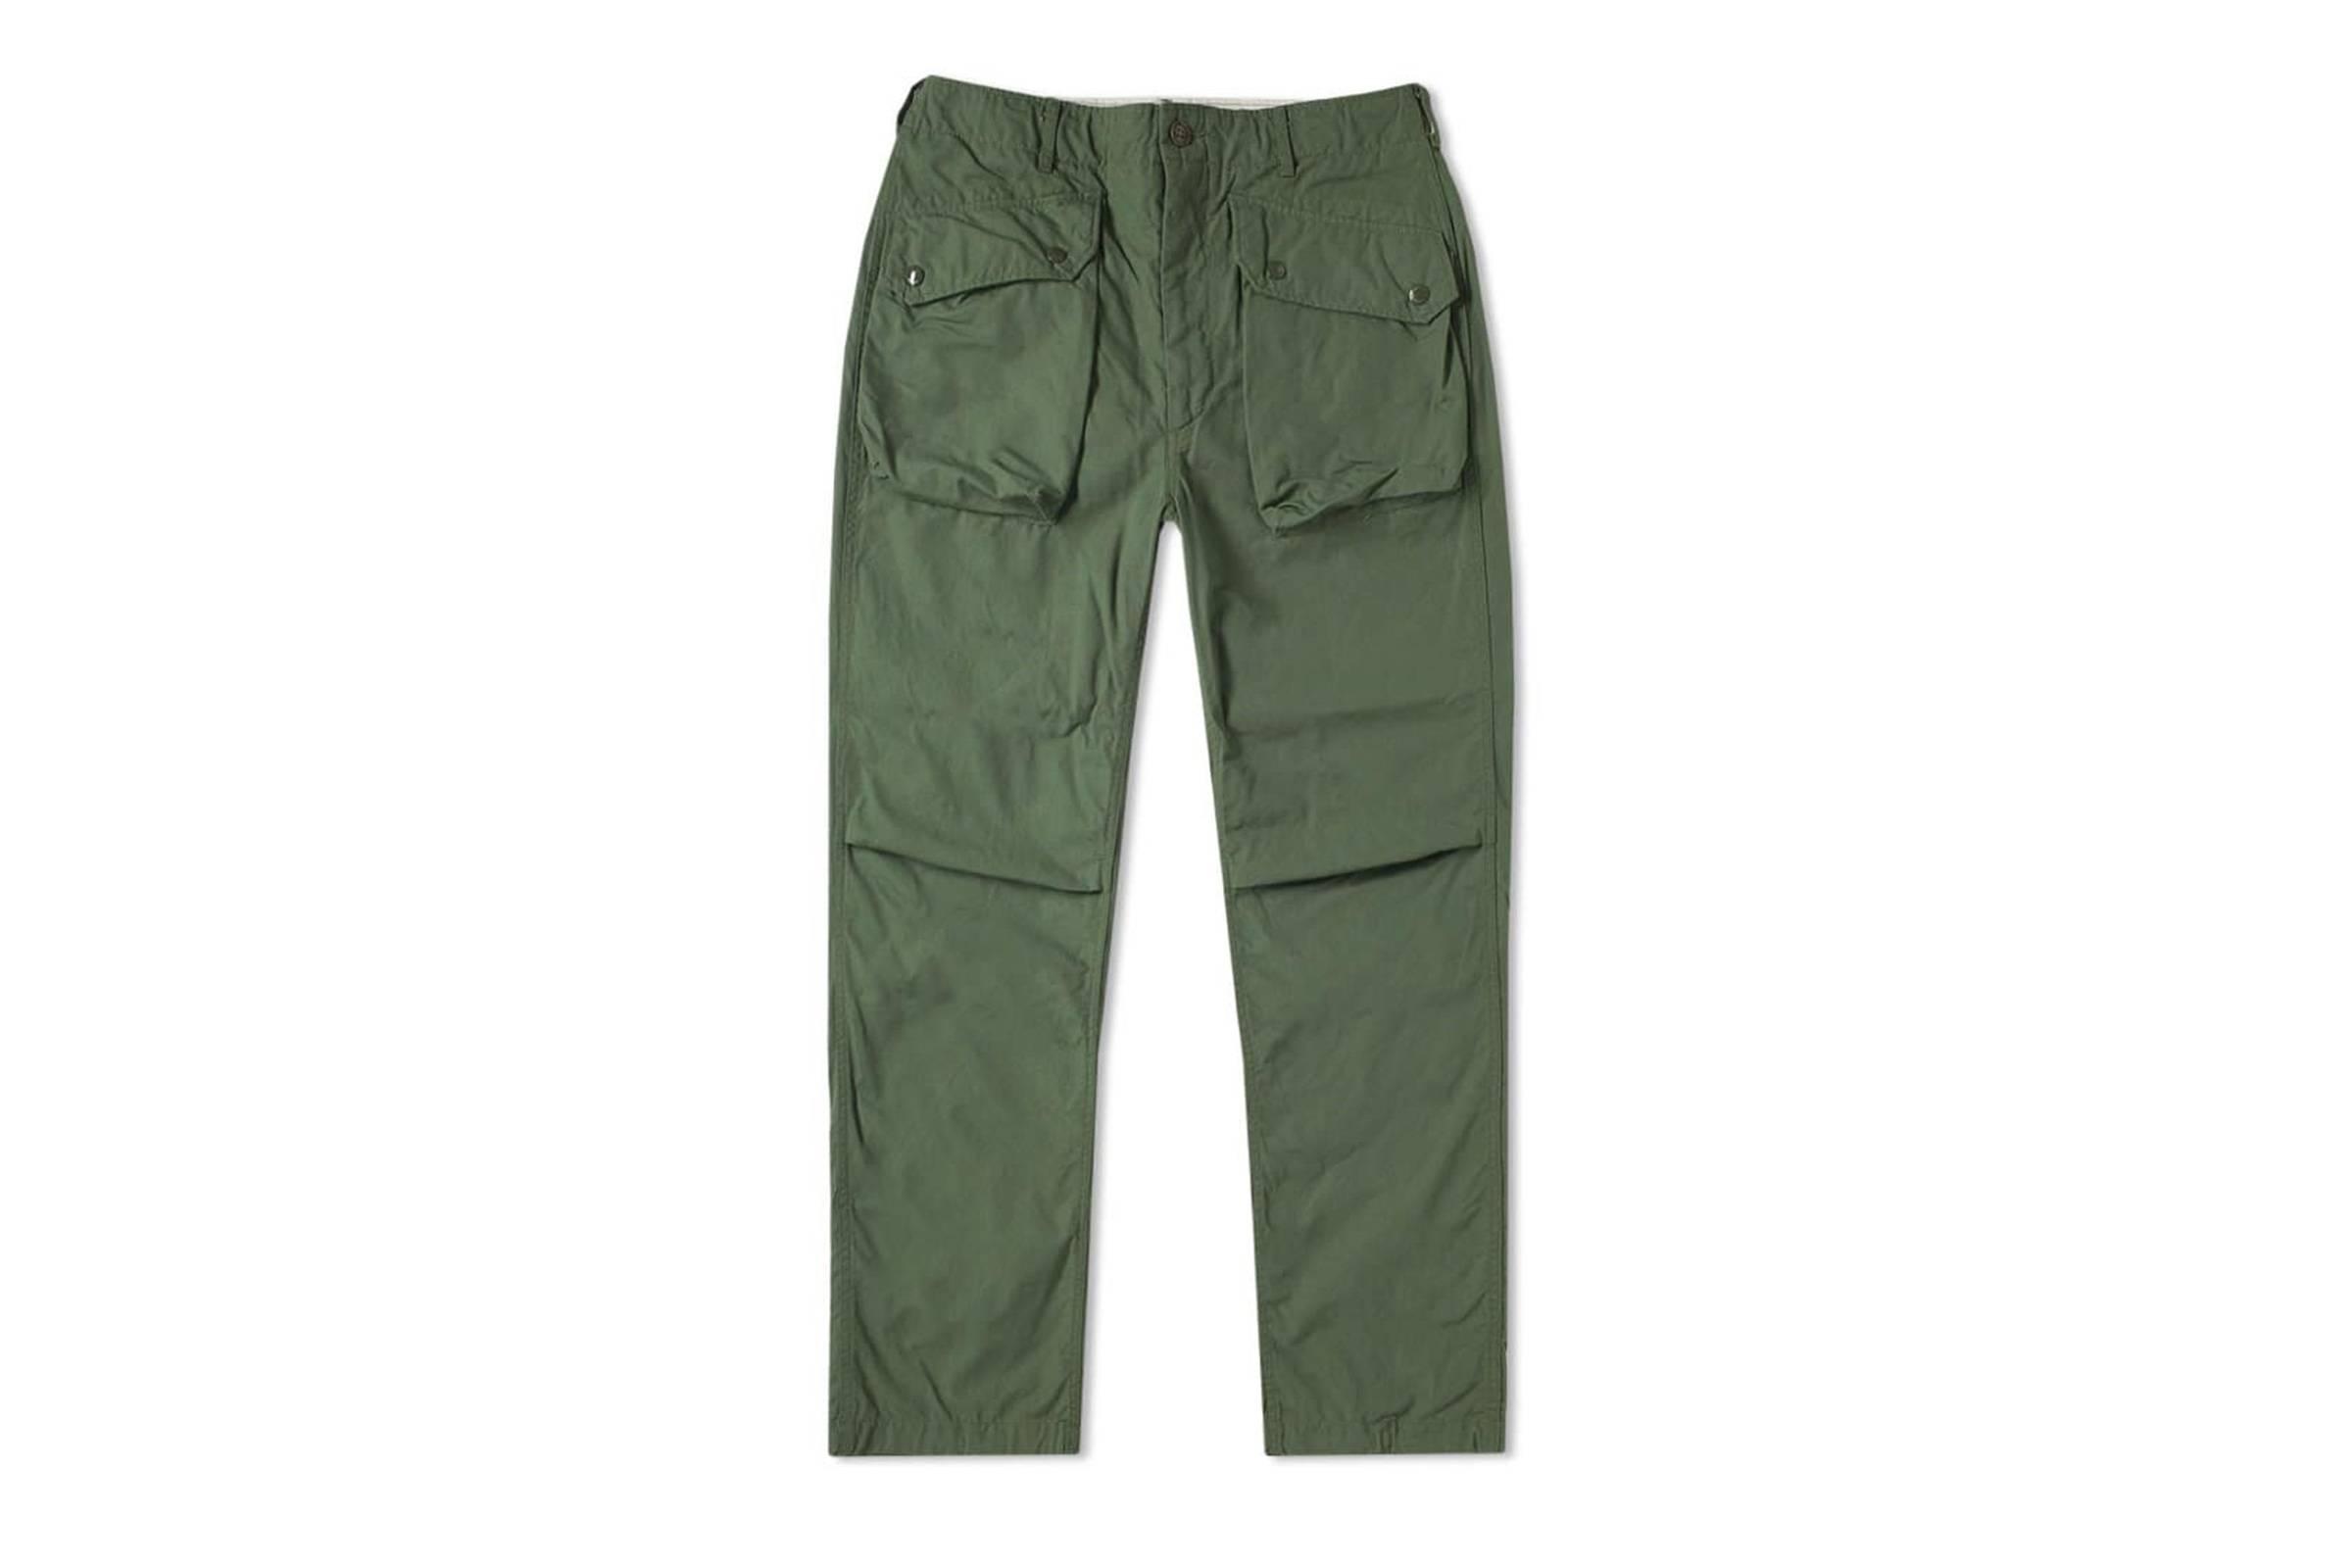 Engineered Garments Norwegian Pants